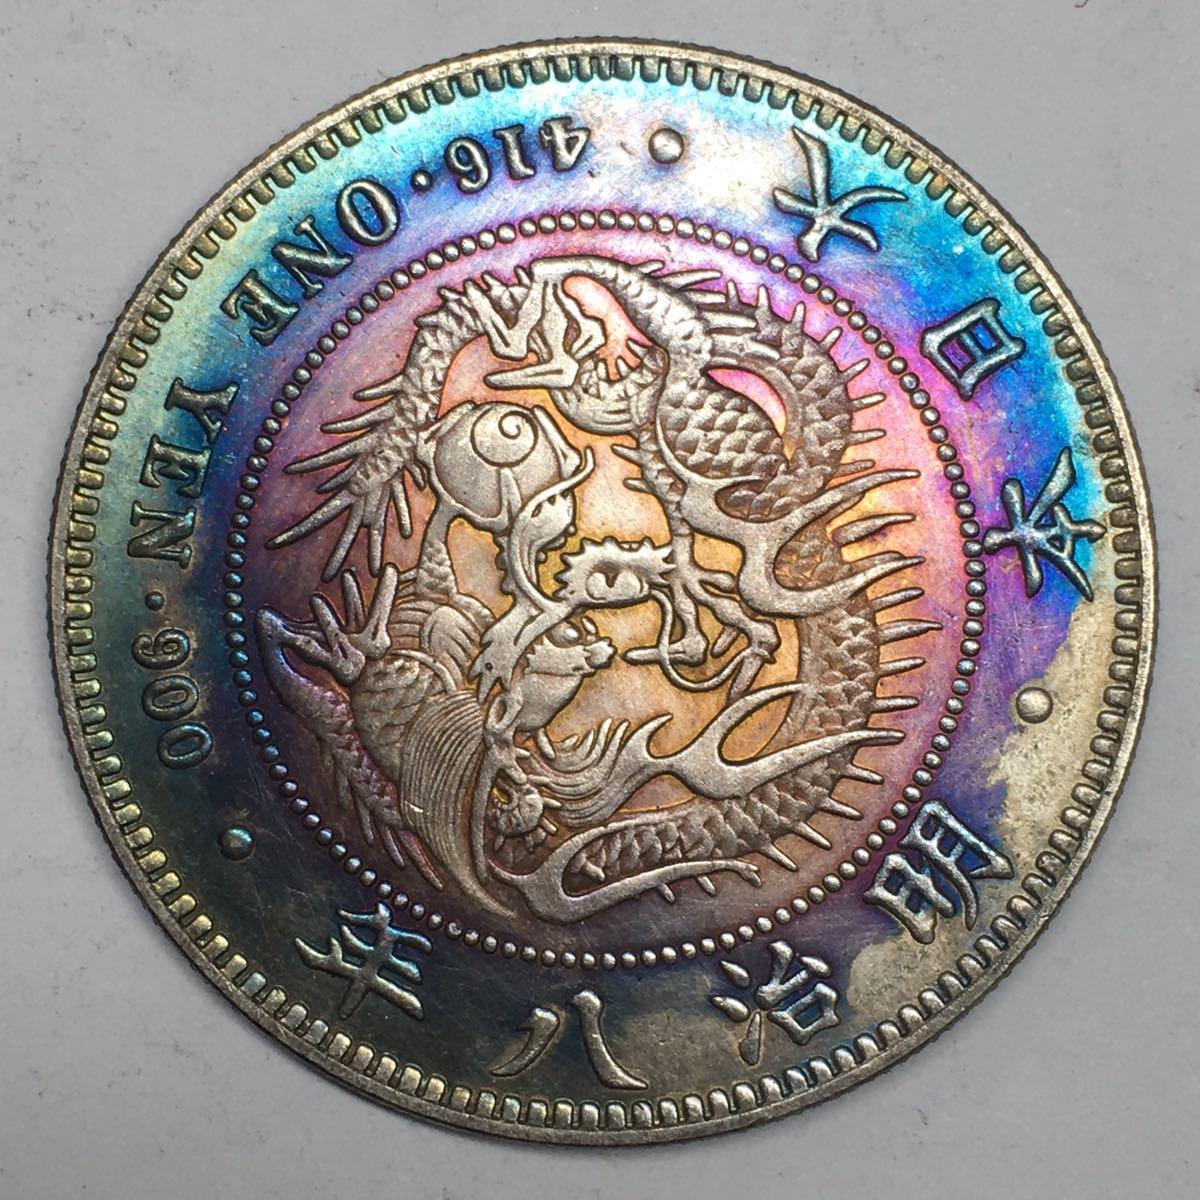 ES5-305 明治八年一円銀貨 日本古銭 量目26.45_画像2